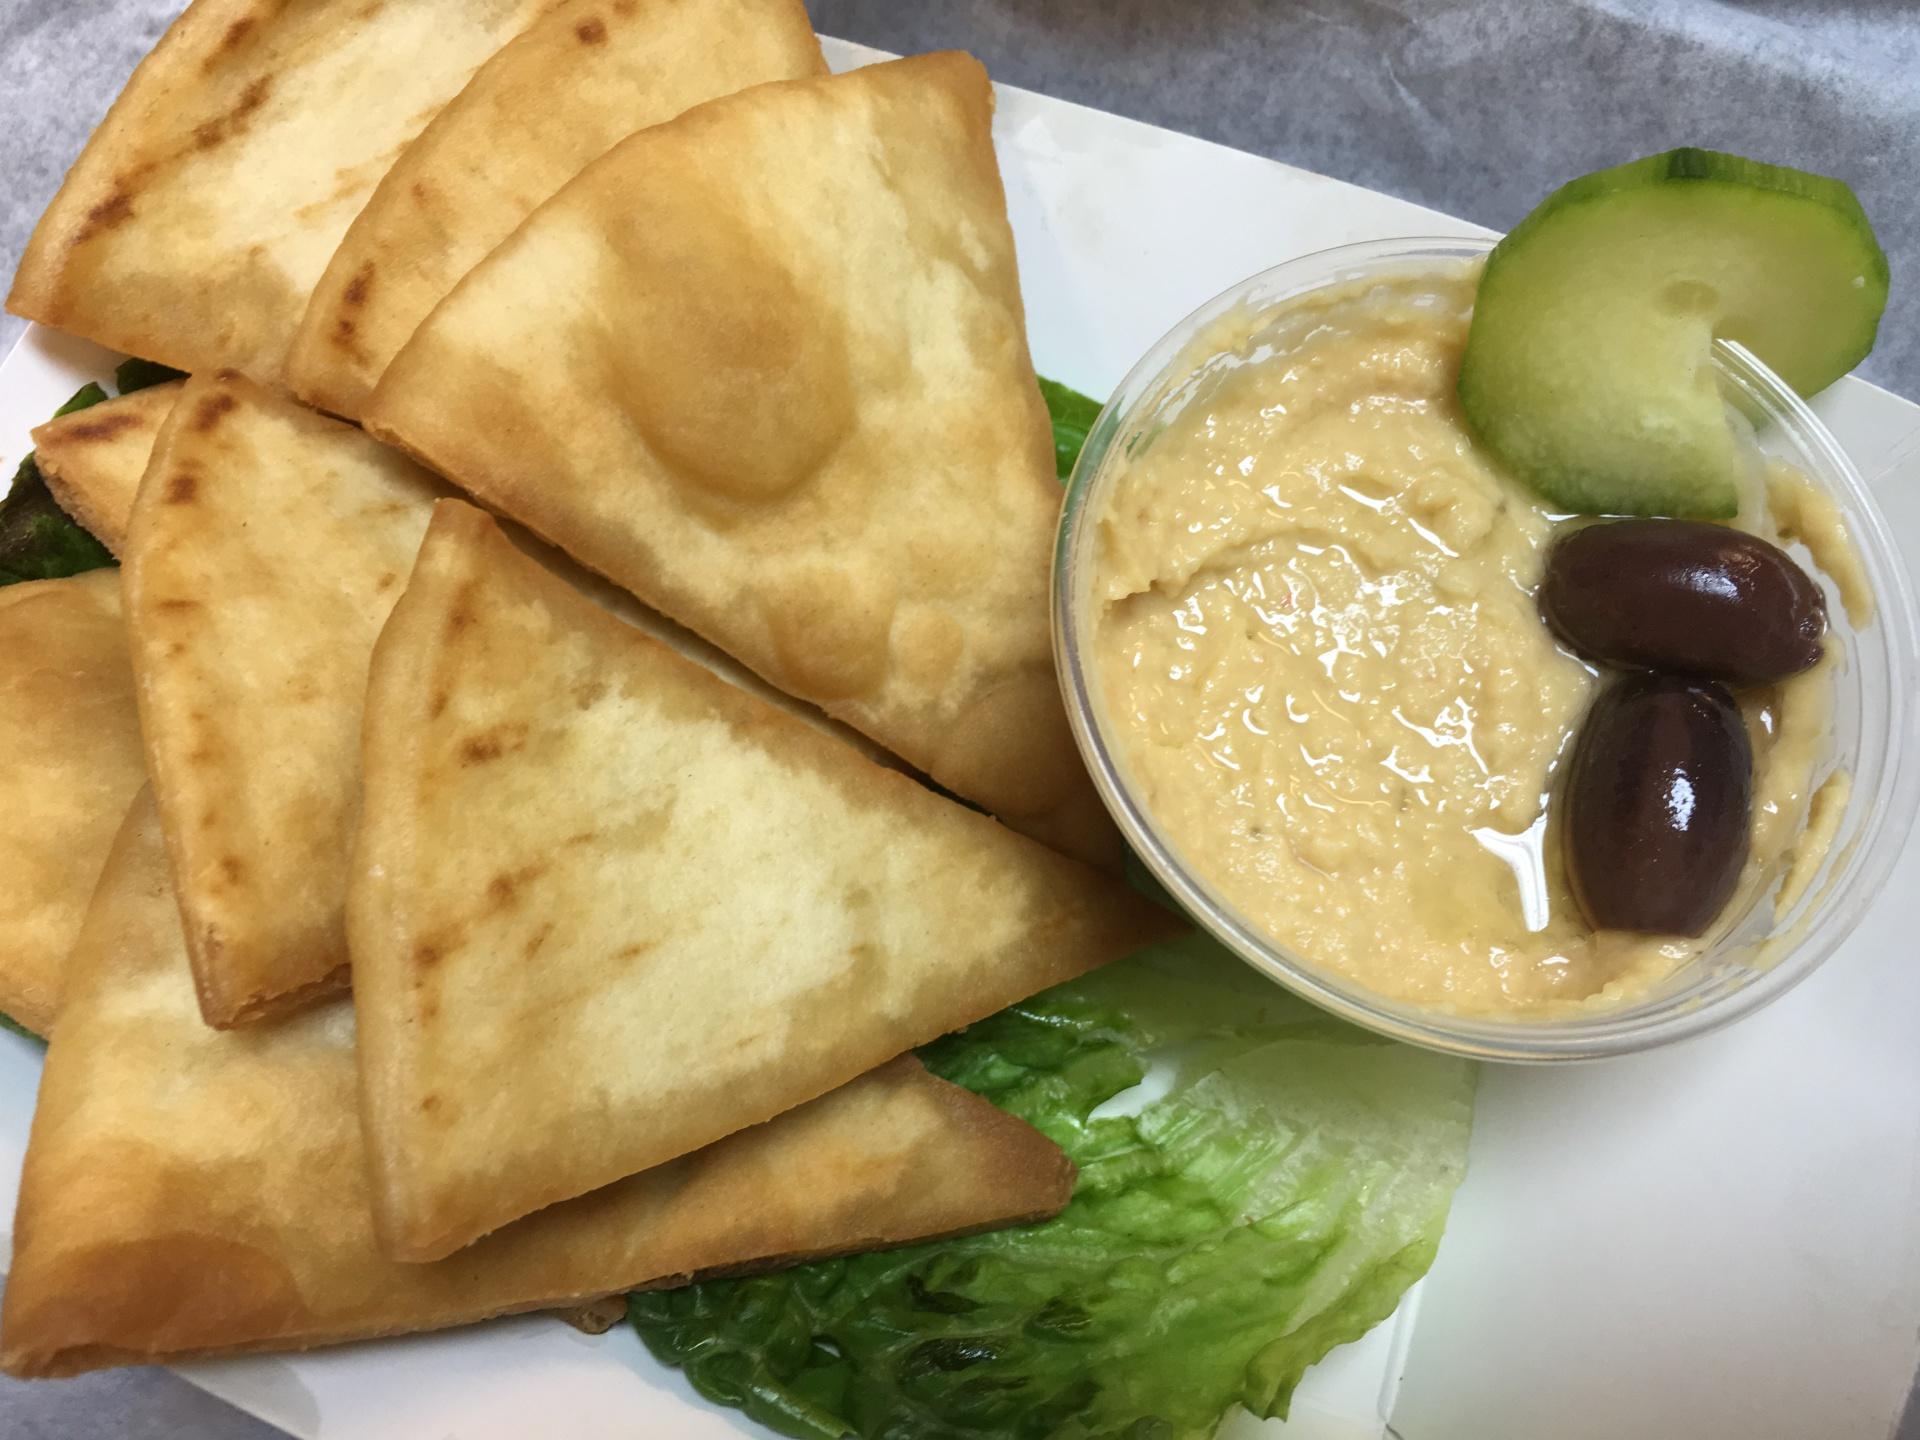 Greek Hummus with Fresh Fried Pita Chips